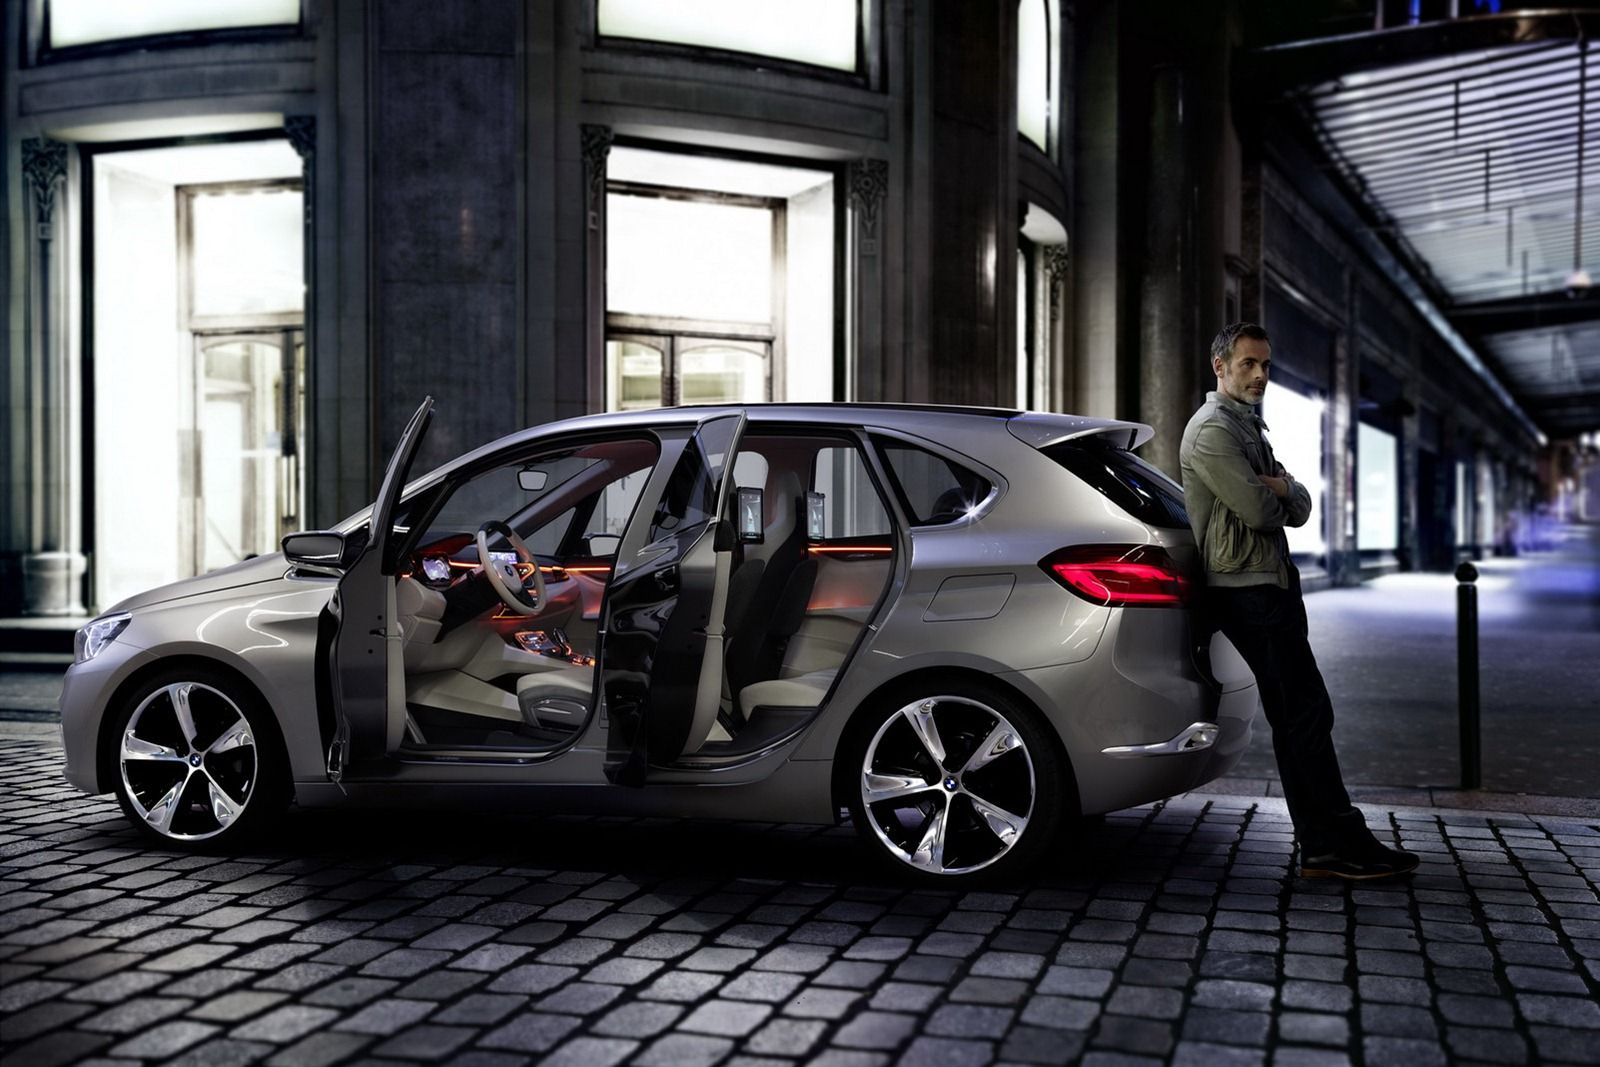 BMW Active Tourer Concept | Cars | Pinterest | Cars auto, BMW and Cars